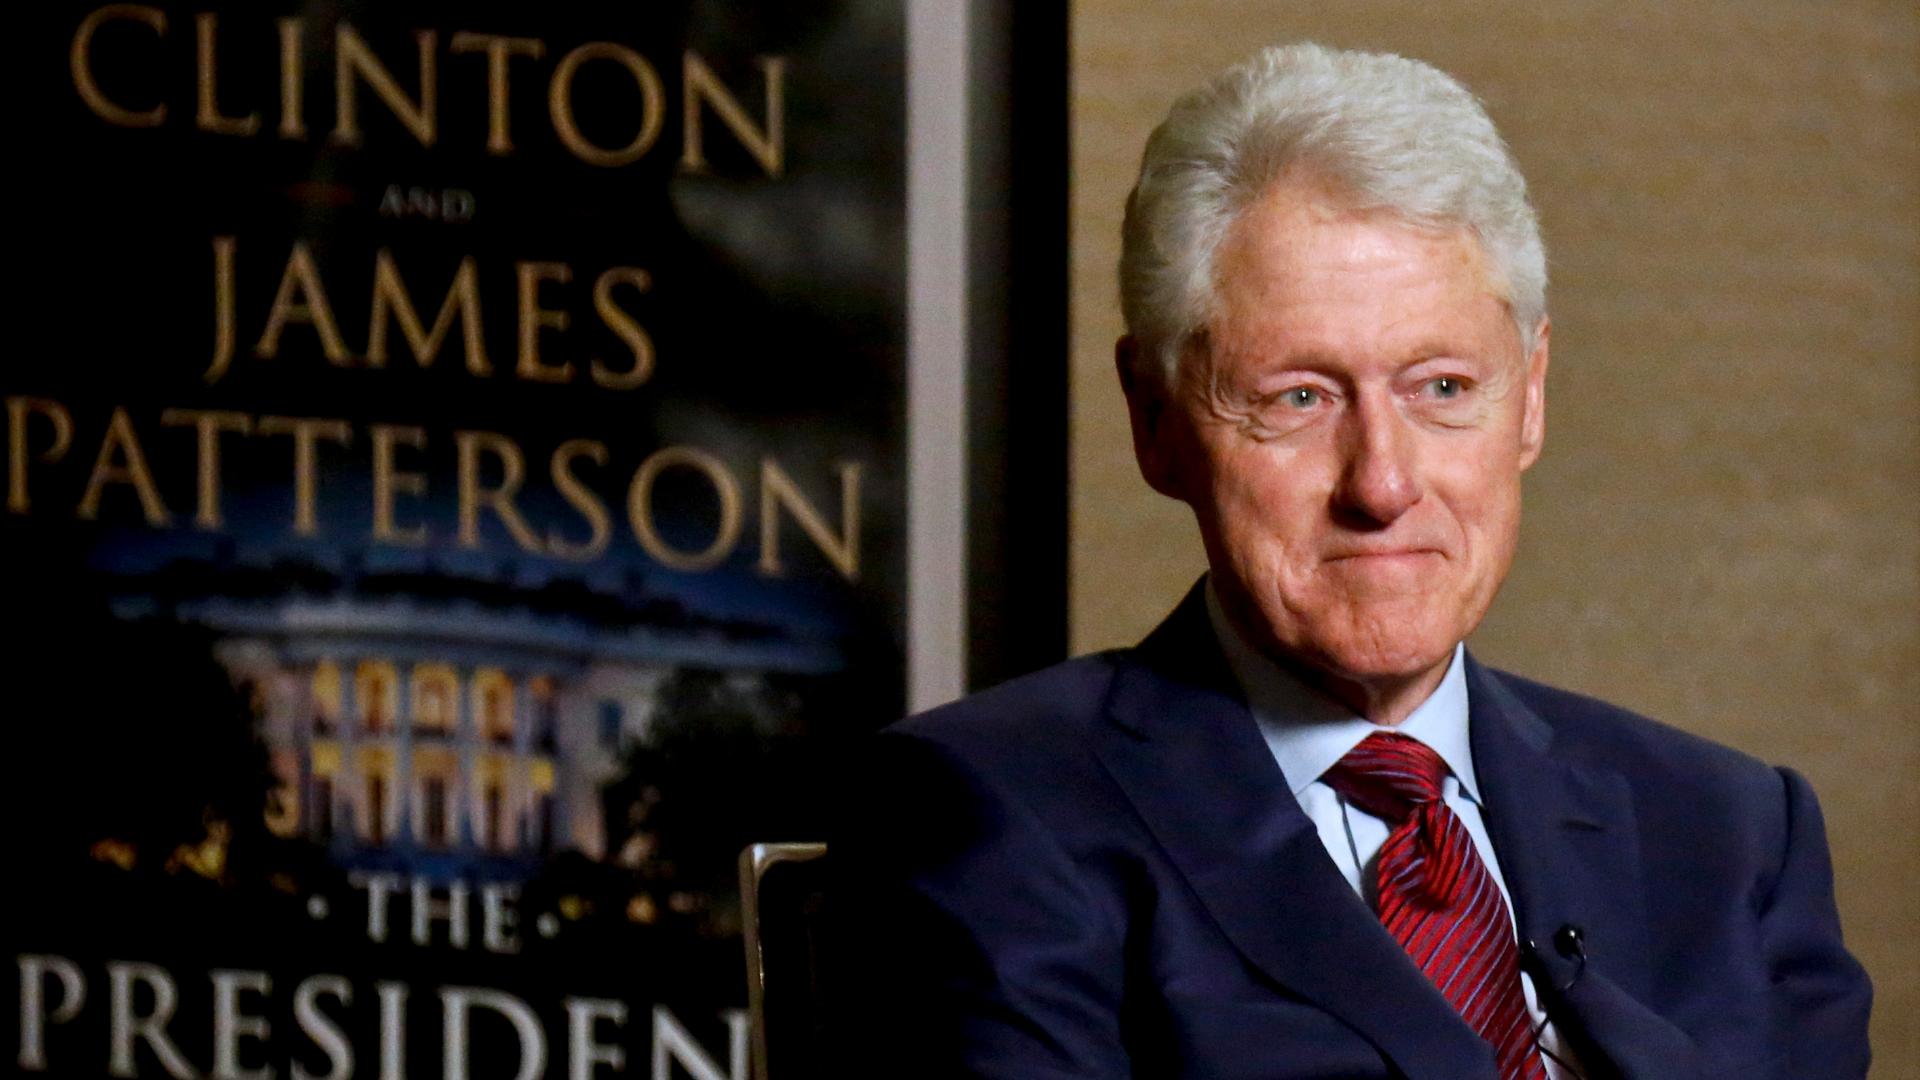 Fact-Checking Bill Clinton's meltdown on NBC's 'Today Show'